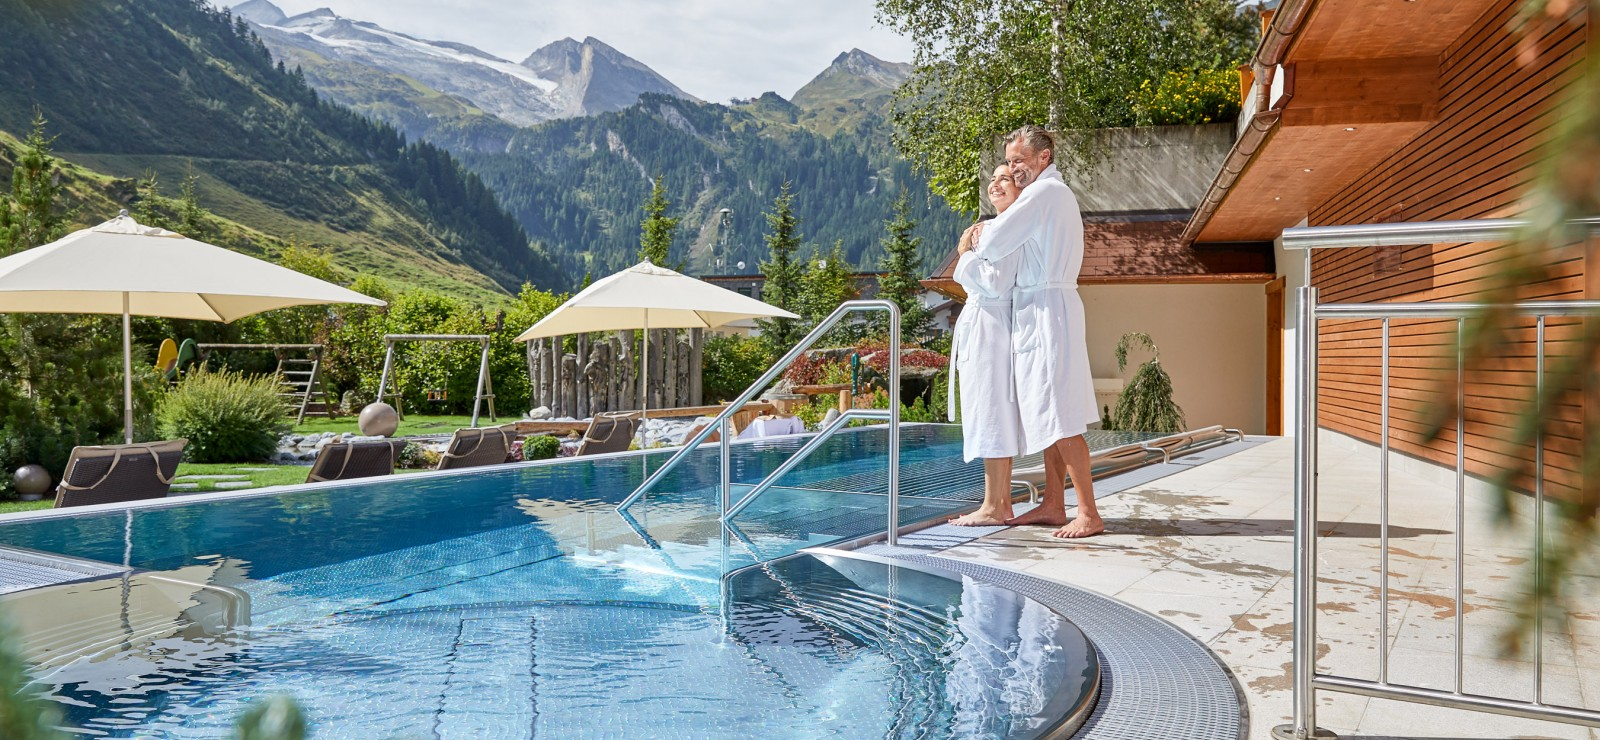 Hotel alpenhof hintertux hotelbewertung for Wellnesshotel nahe gottingen